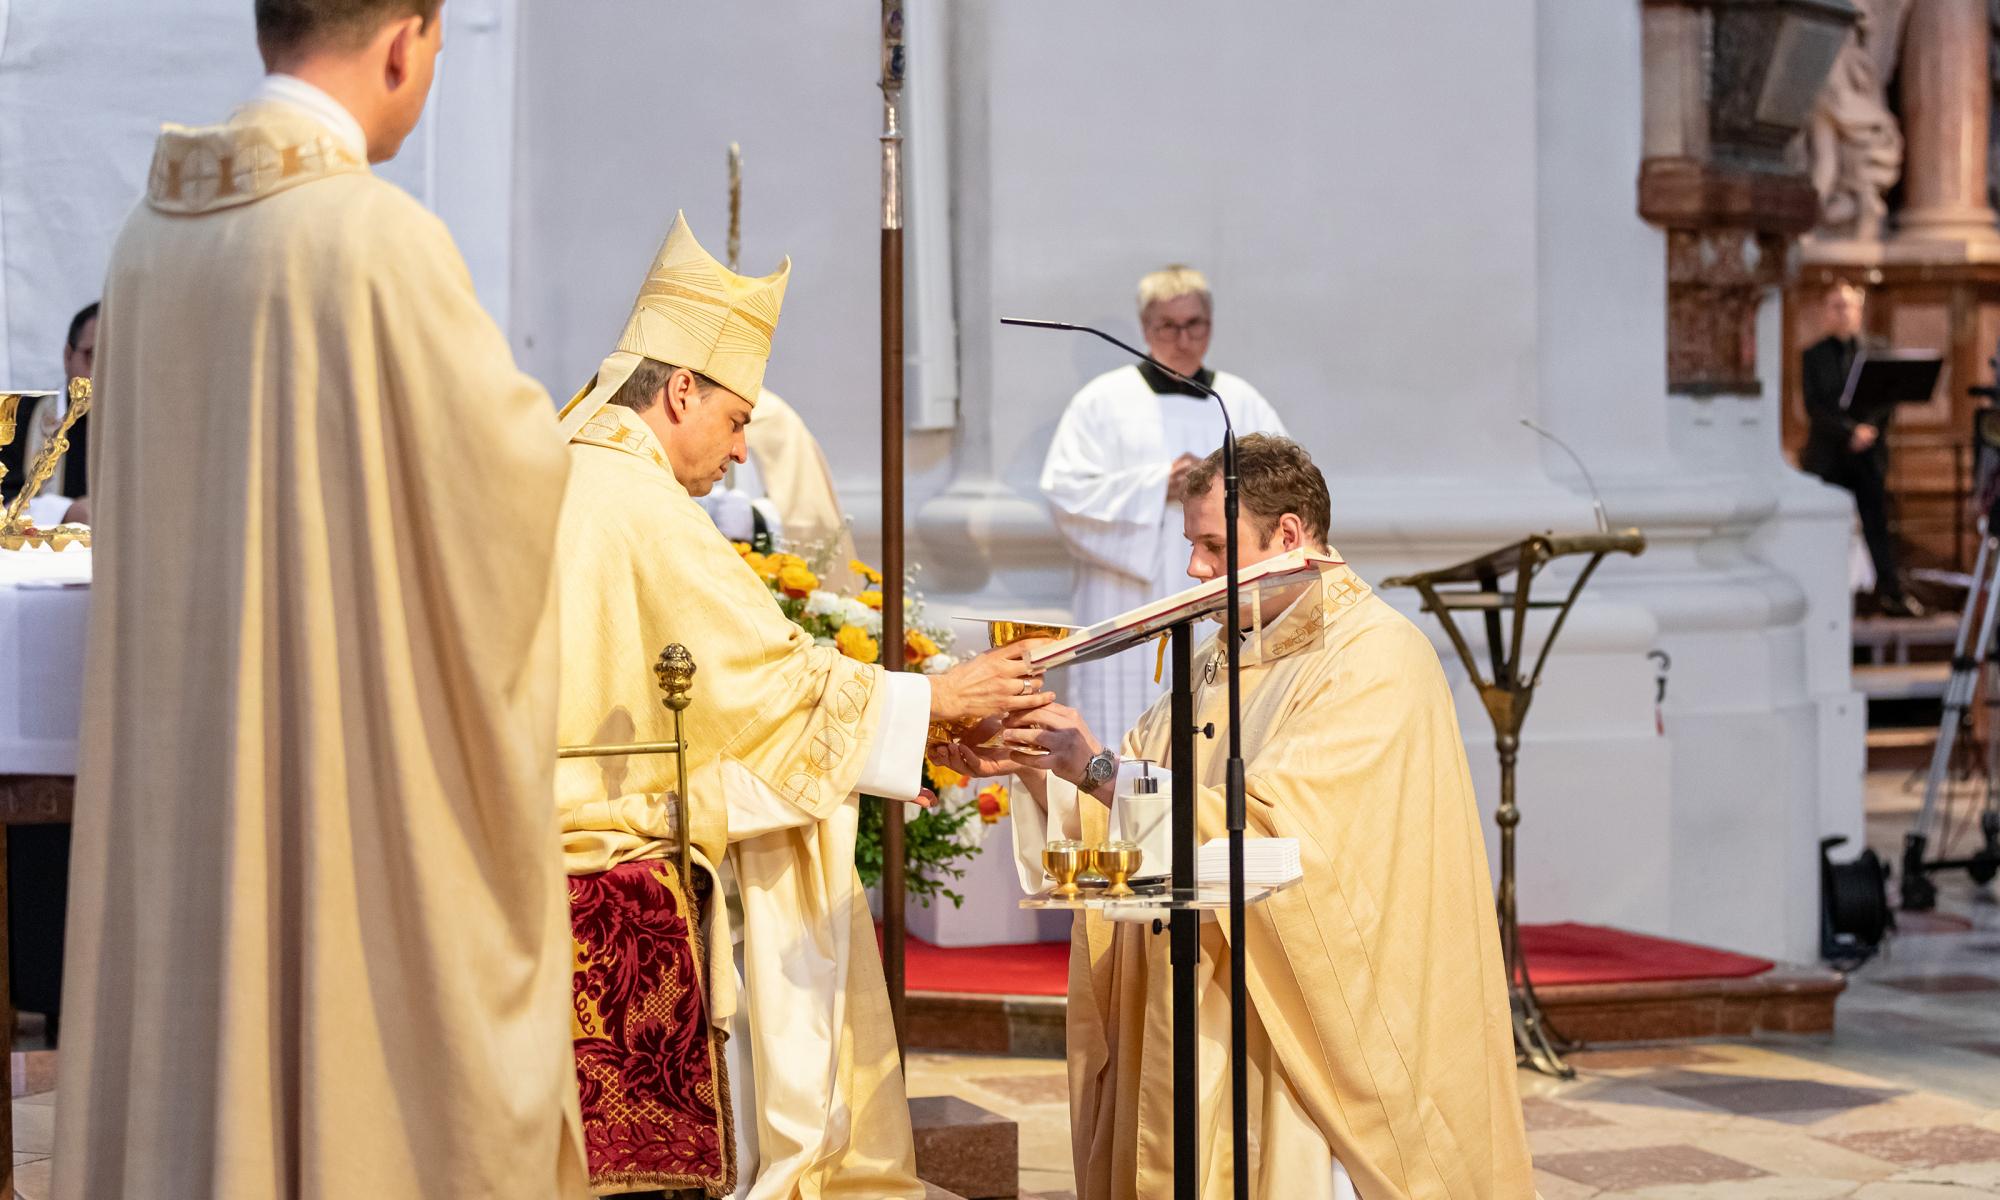 200627 Priesterweihe foto5 Simona Kehl